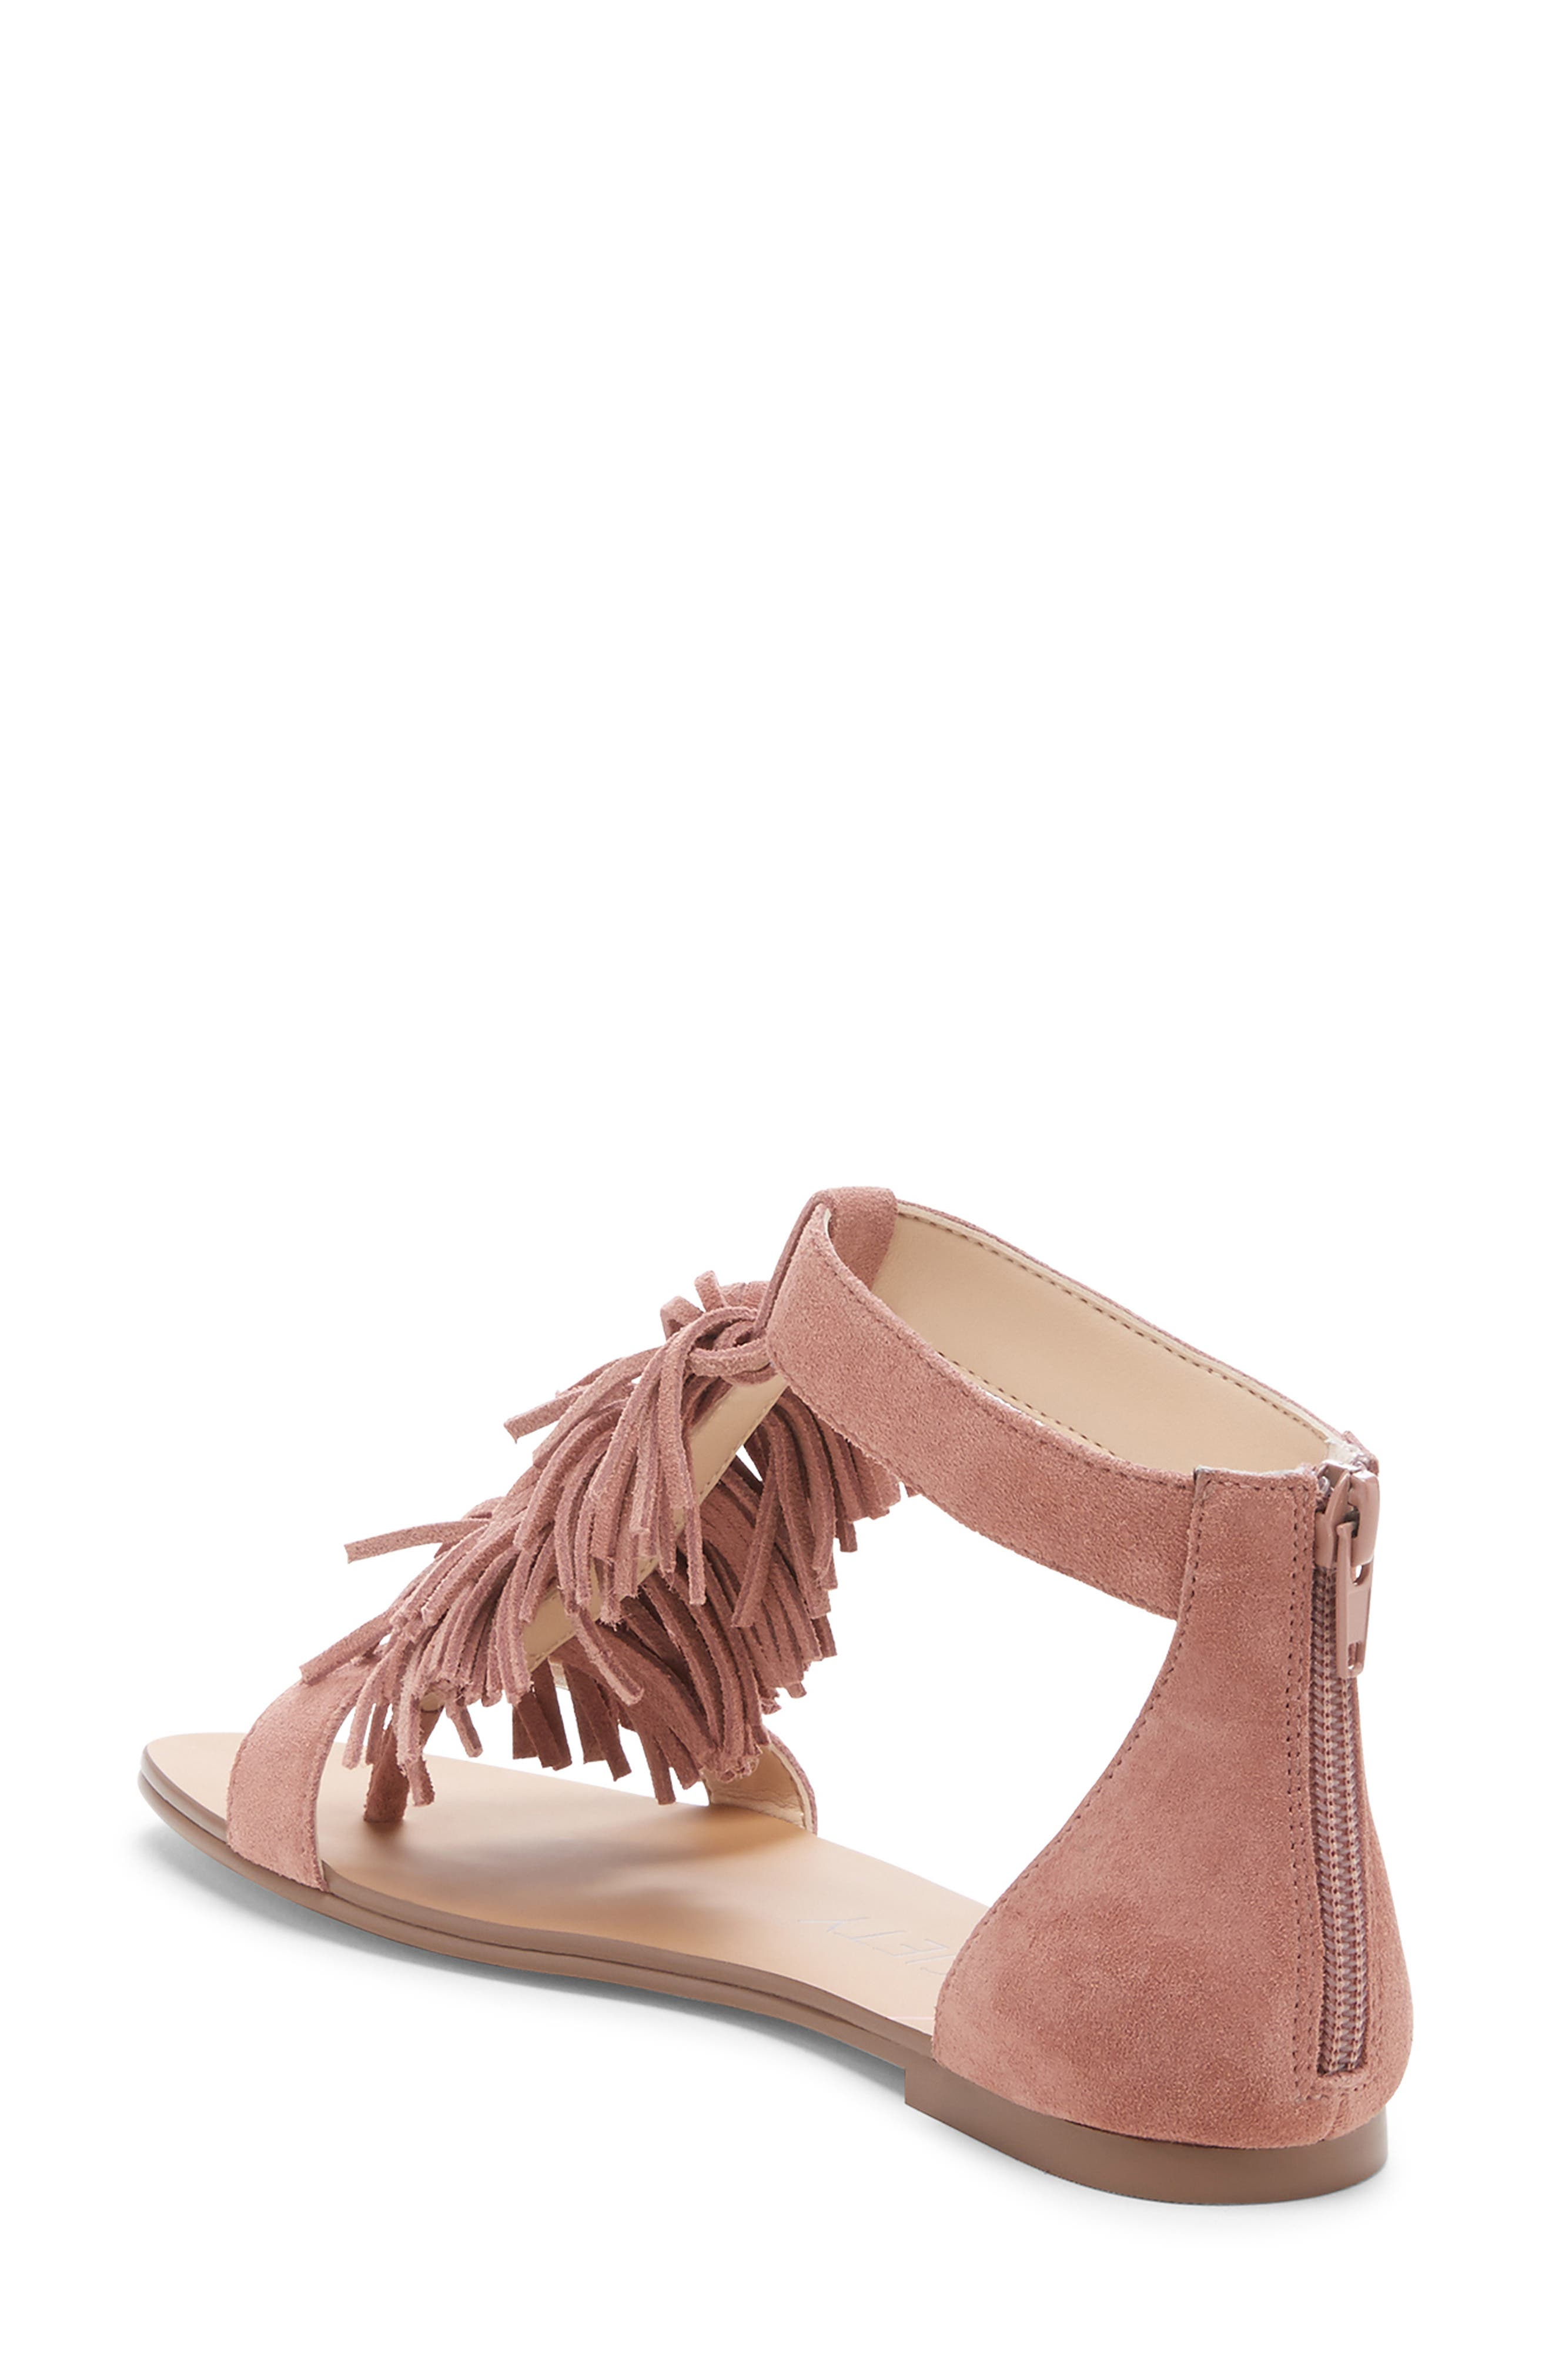 cc05c989c0 Women s Sole Society Shoes